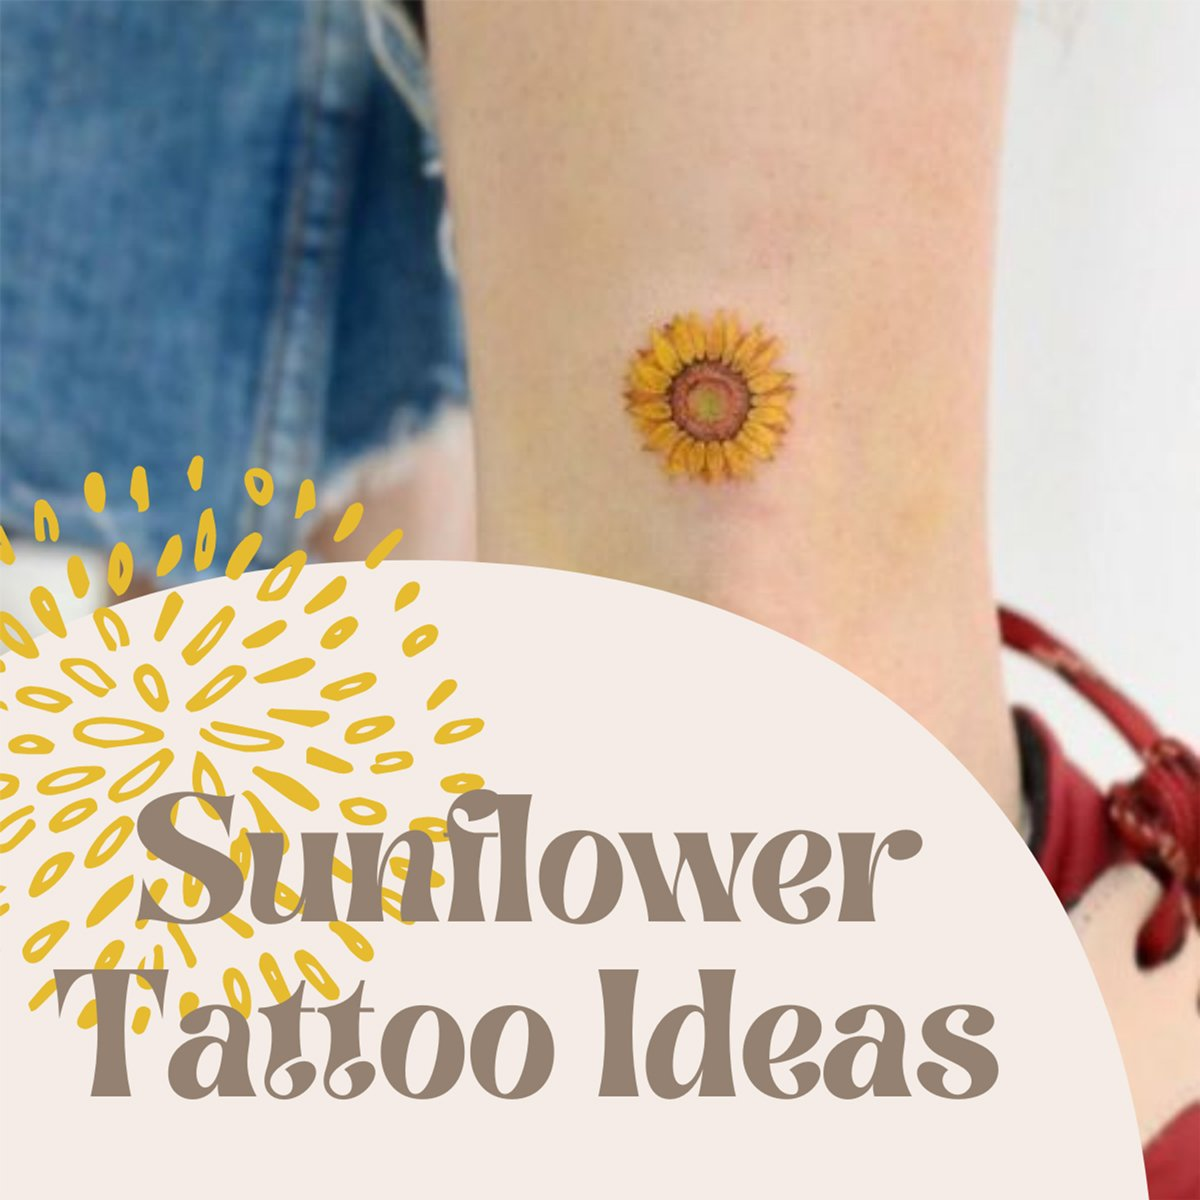 Small Sunflower Tattoo Ideas